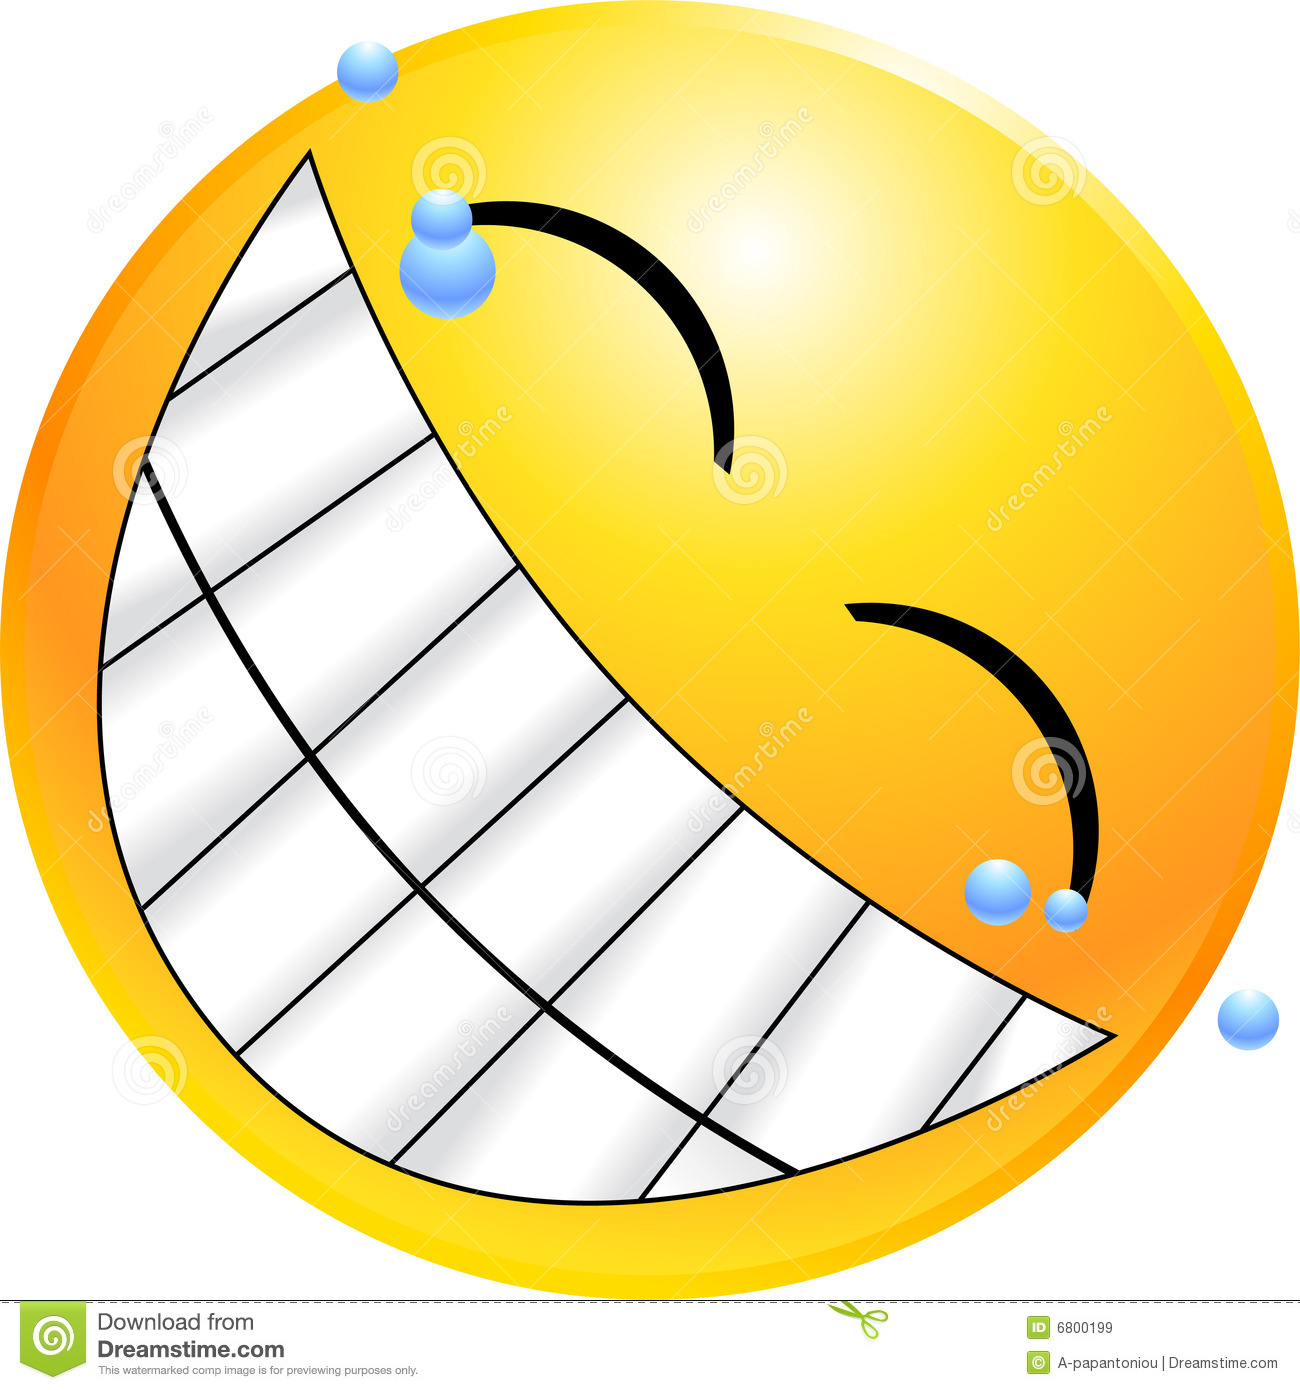 Smiley Face Animated Clip Art-Smiley Face Animated Clip Art-12